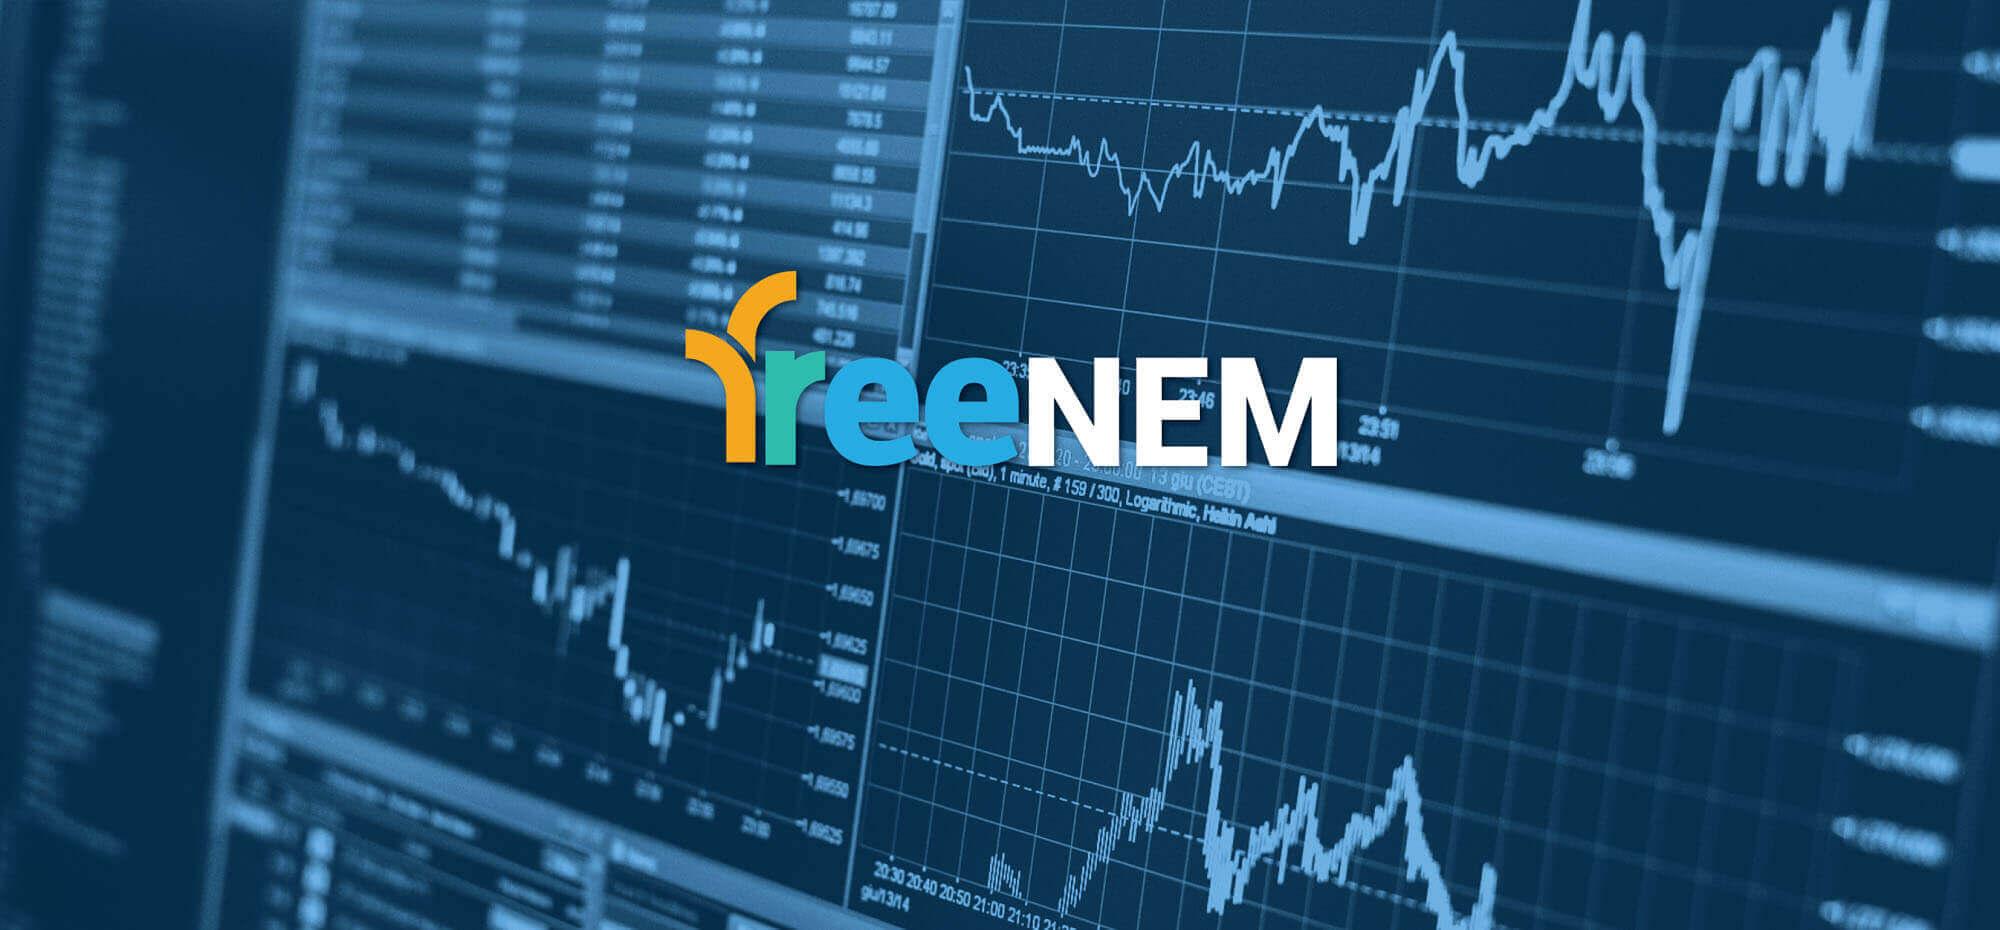 FreeNEM top banner